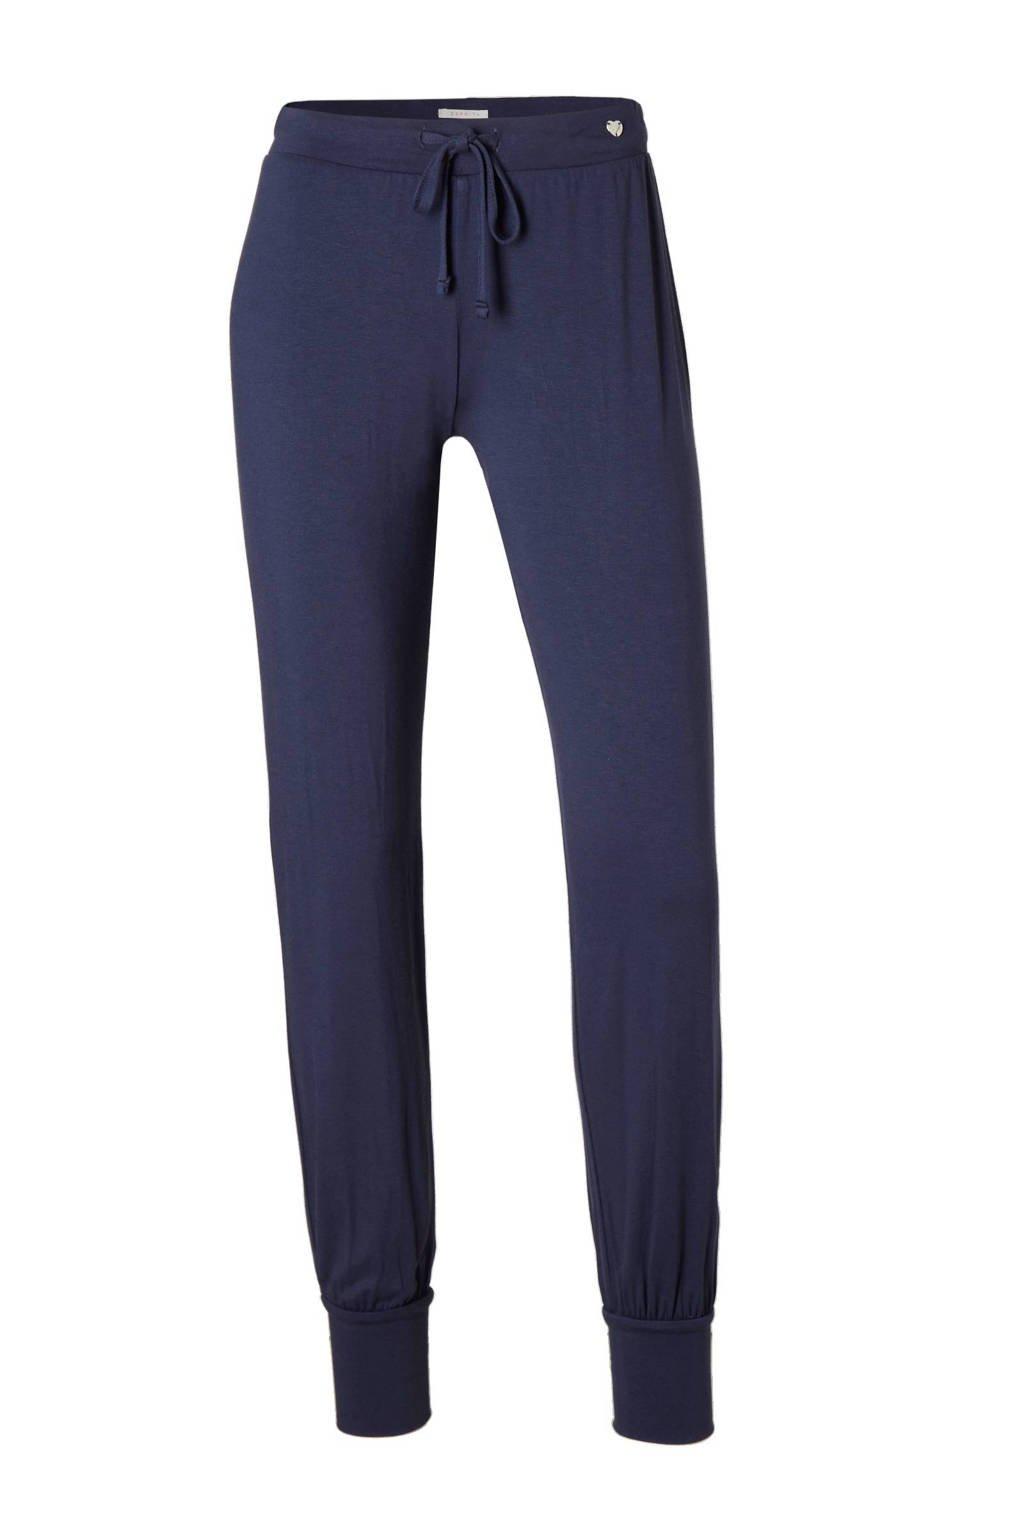 ESPRIT pyjamabroek viscose blauw, Blauw